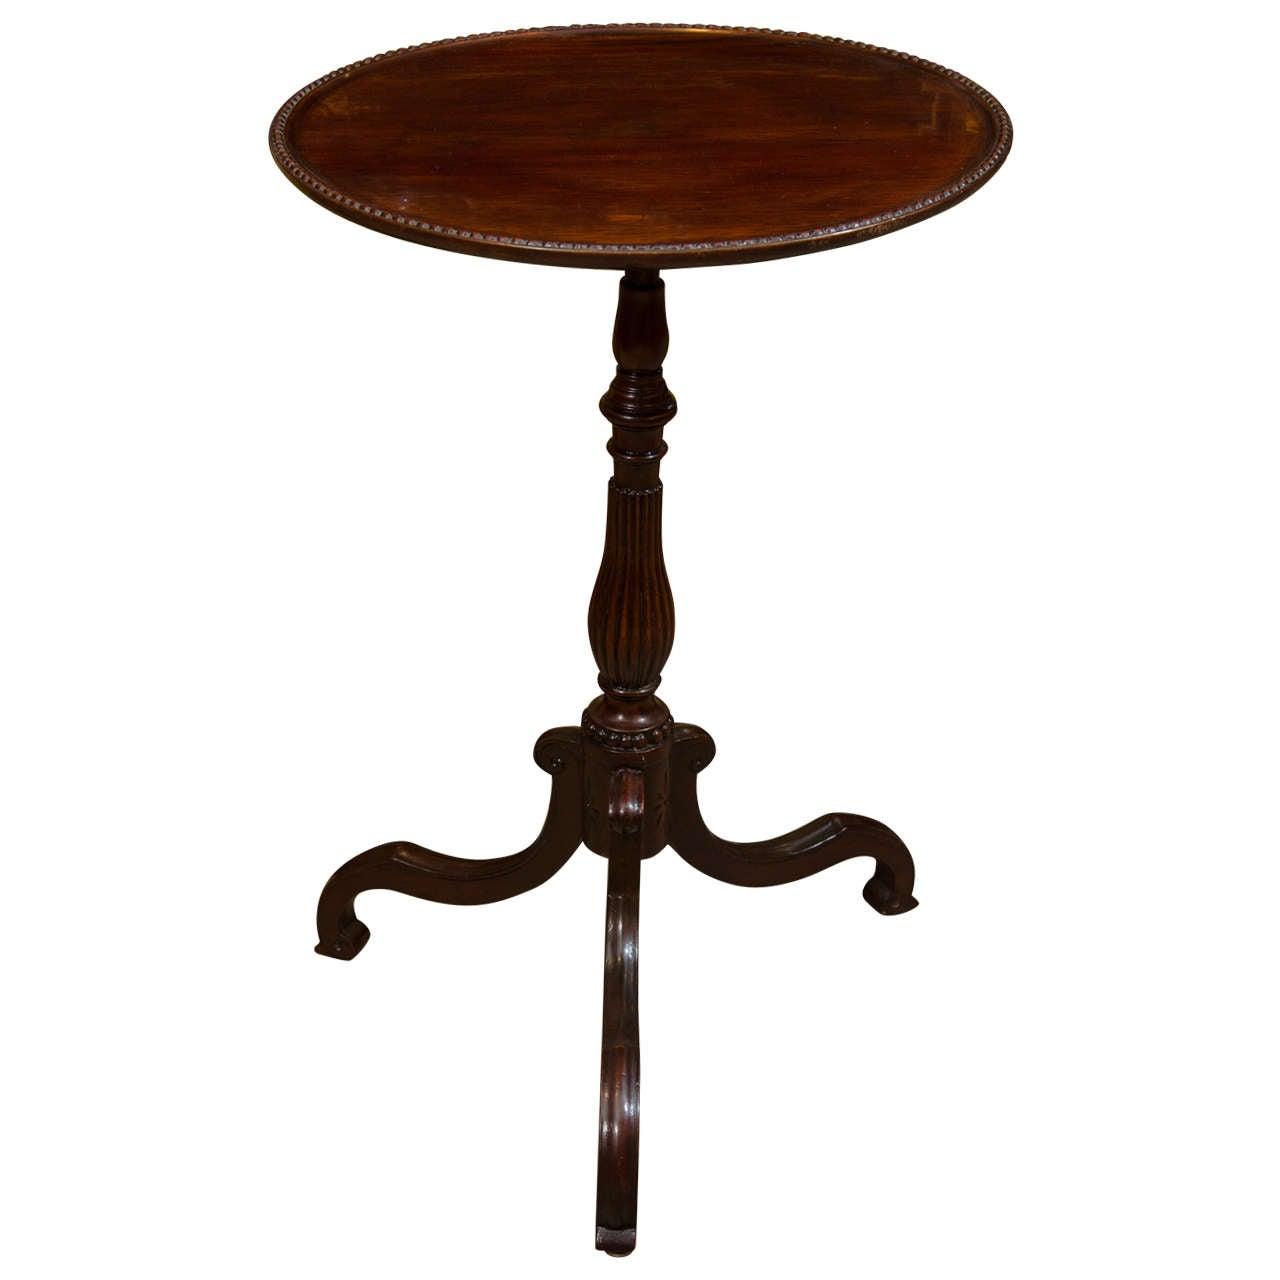 George III Mahogany Dish-Top Side Table